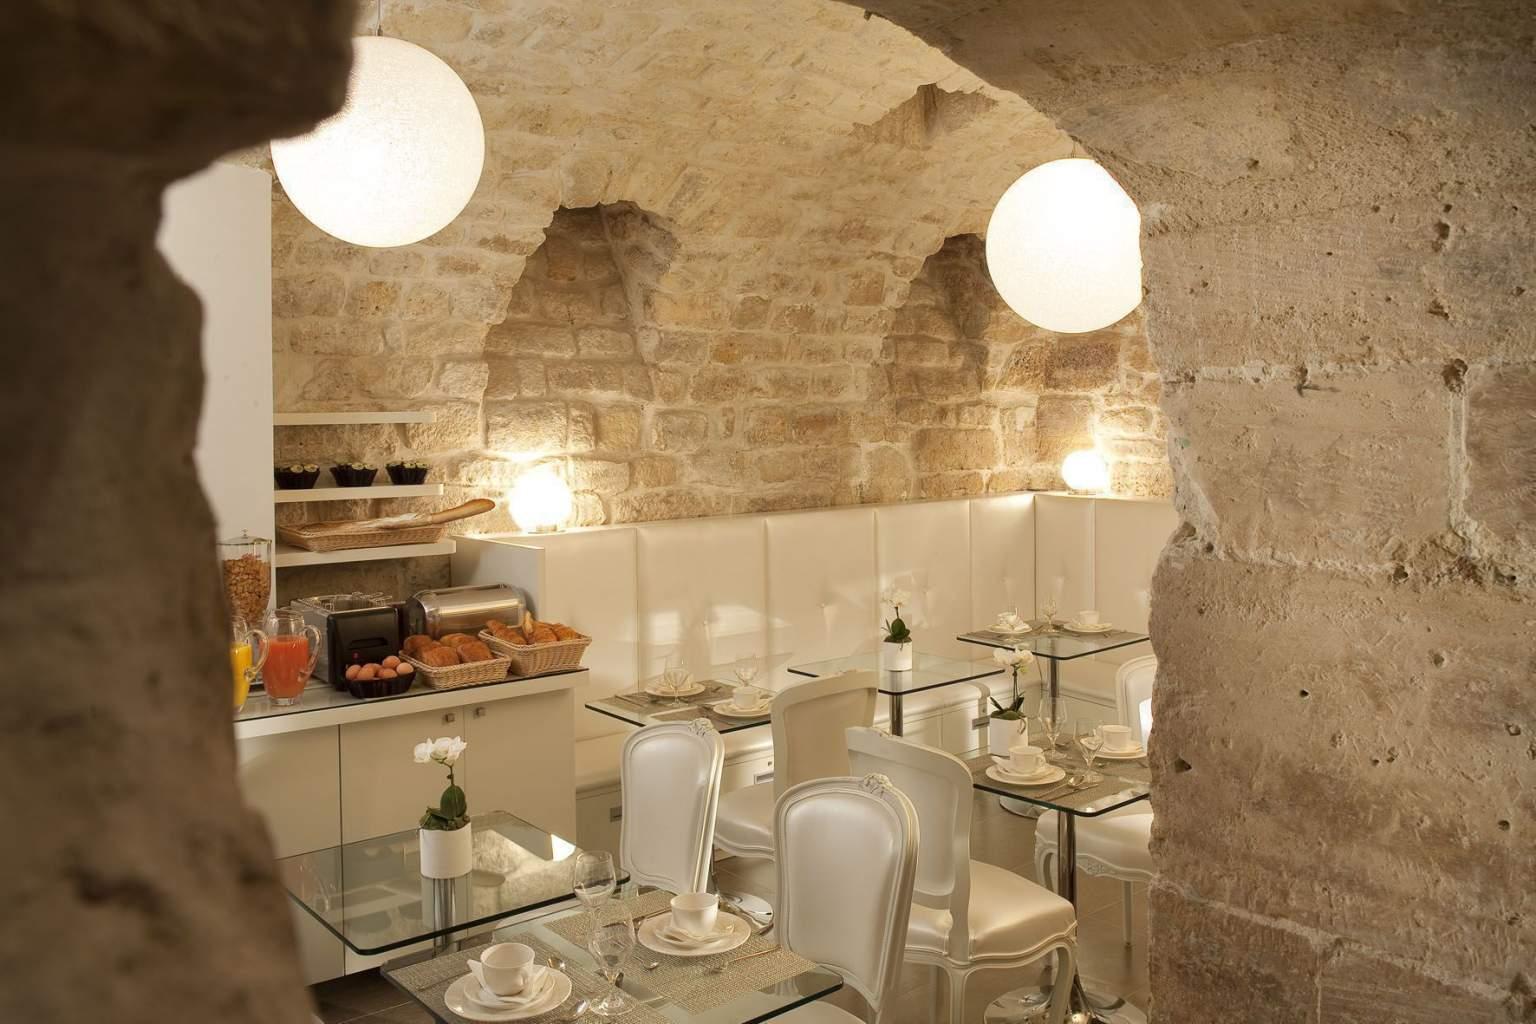 Foto sala pequeno-almoço Hotel Caron Paris